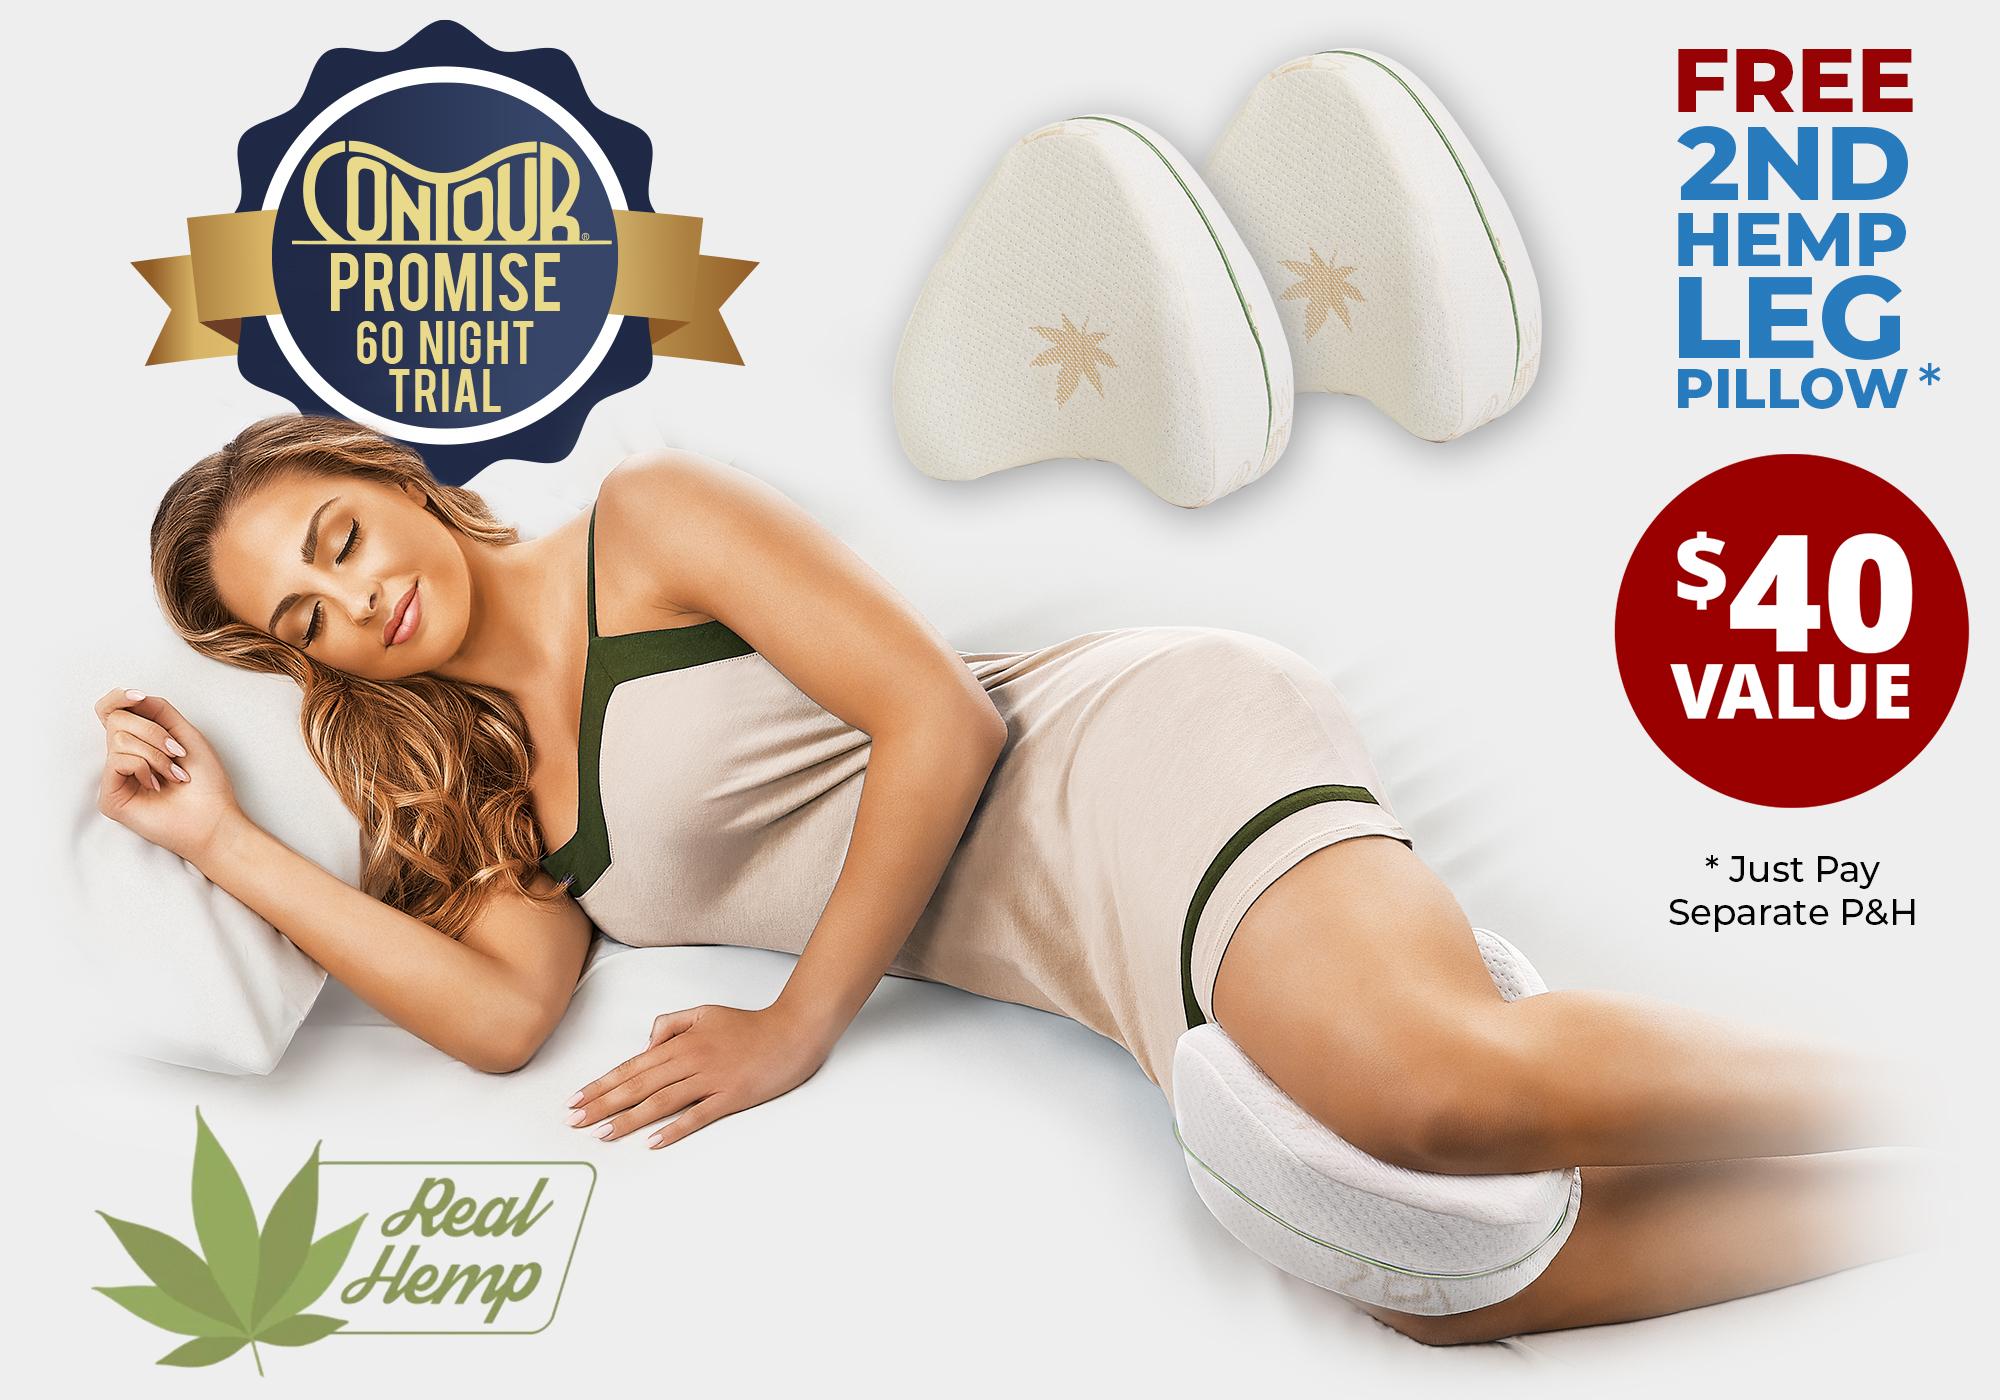 contour legacy hemp leg pillow buy 1